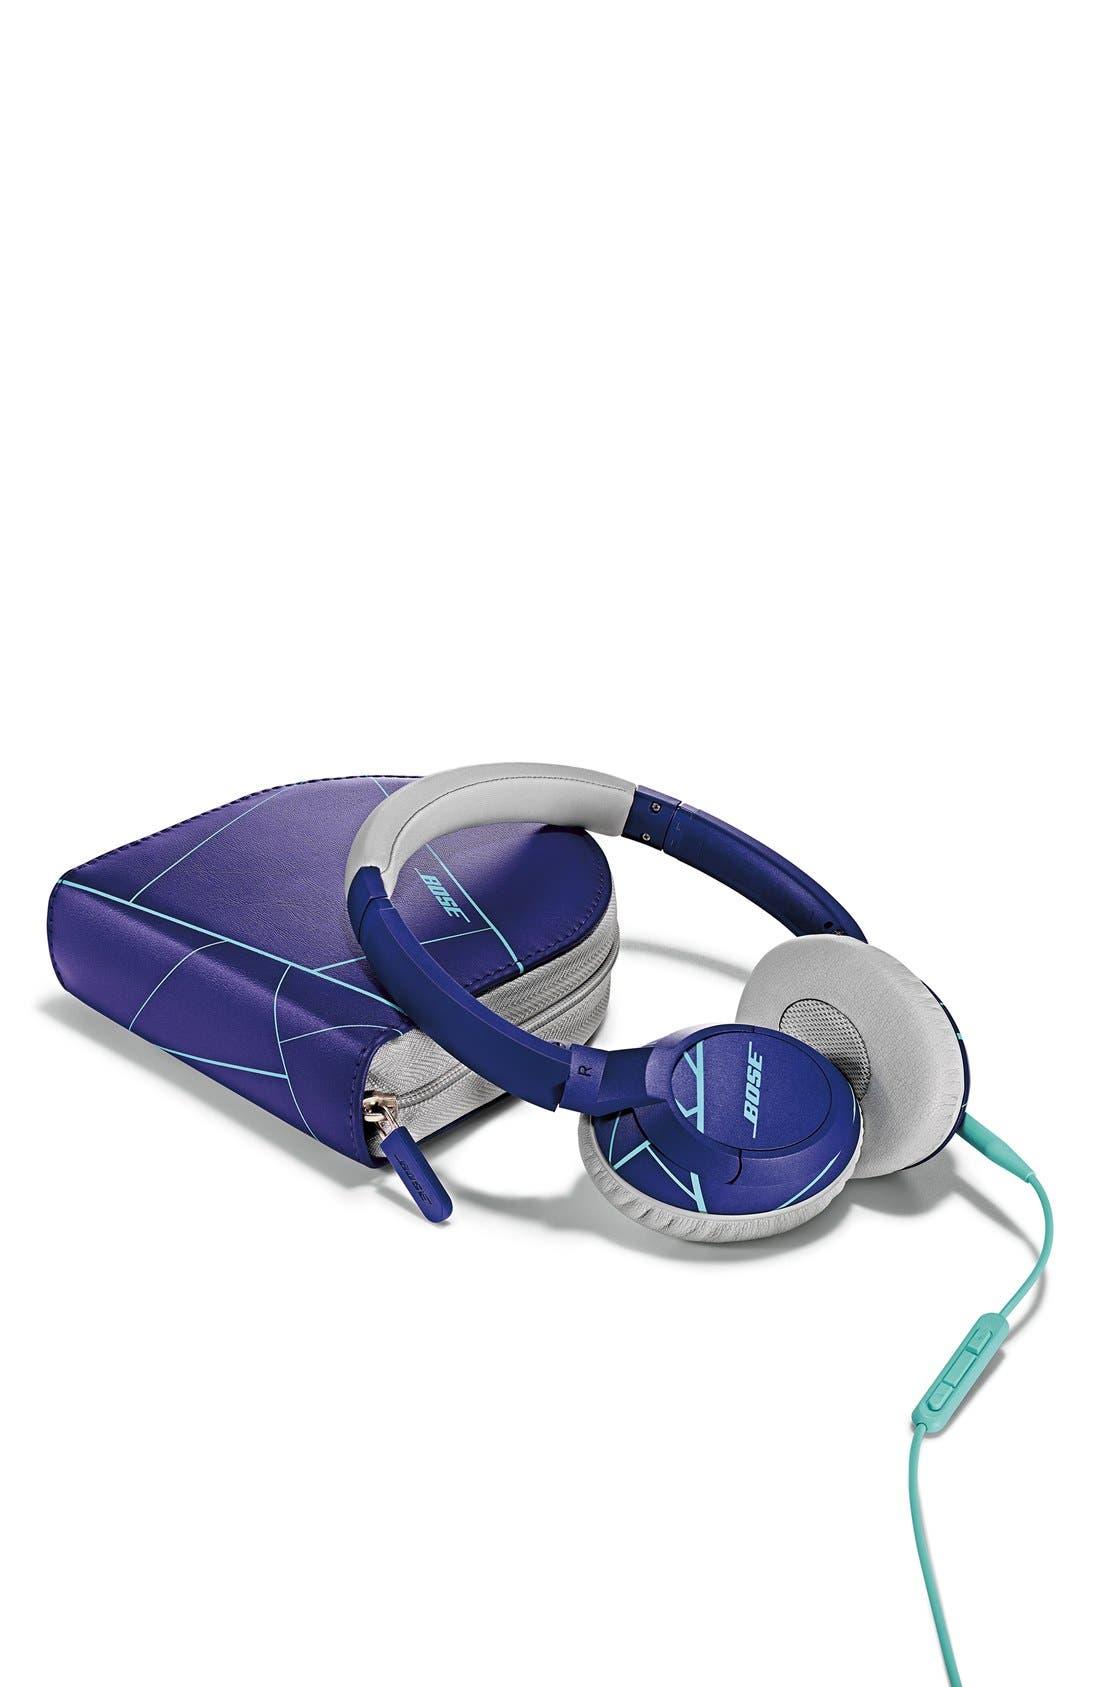 Alternate Image 1 Selected - Bose® SoundTrue™ On-Ear Headphones